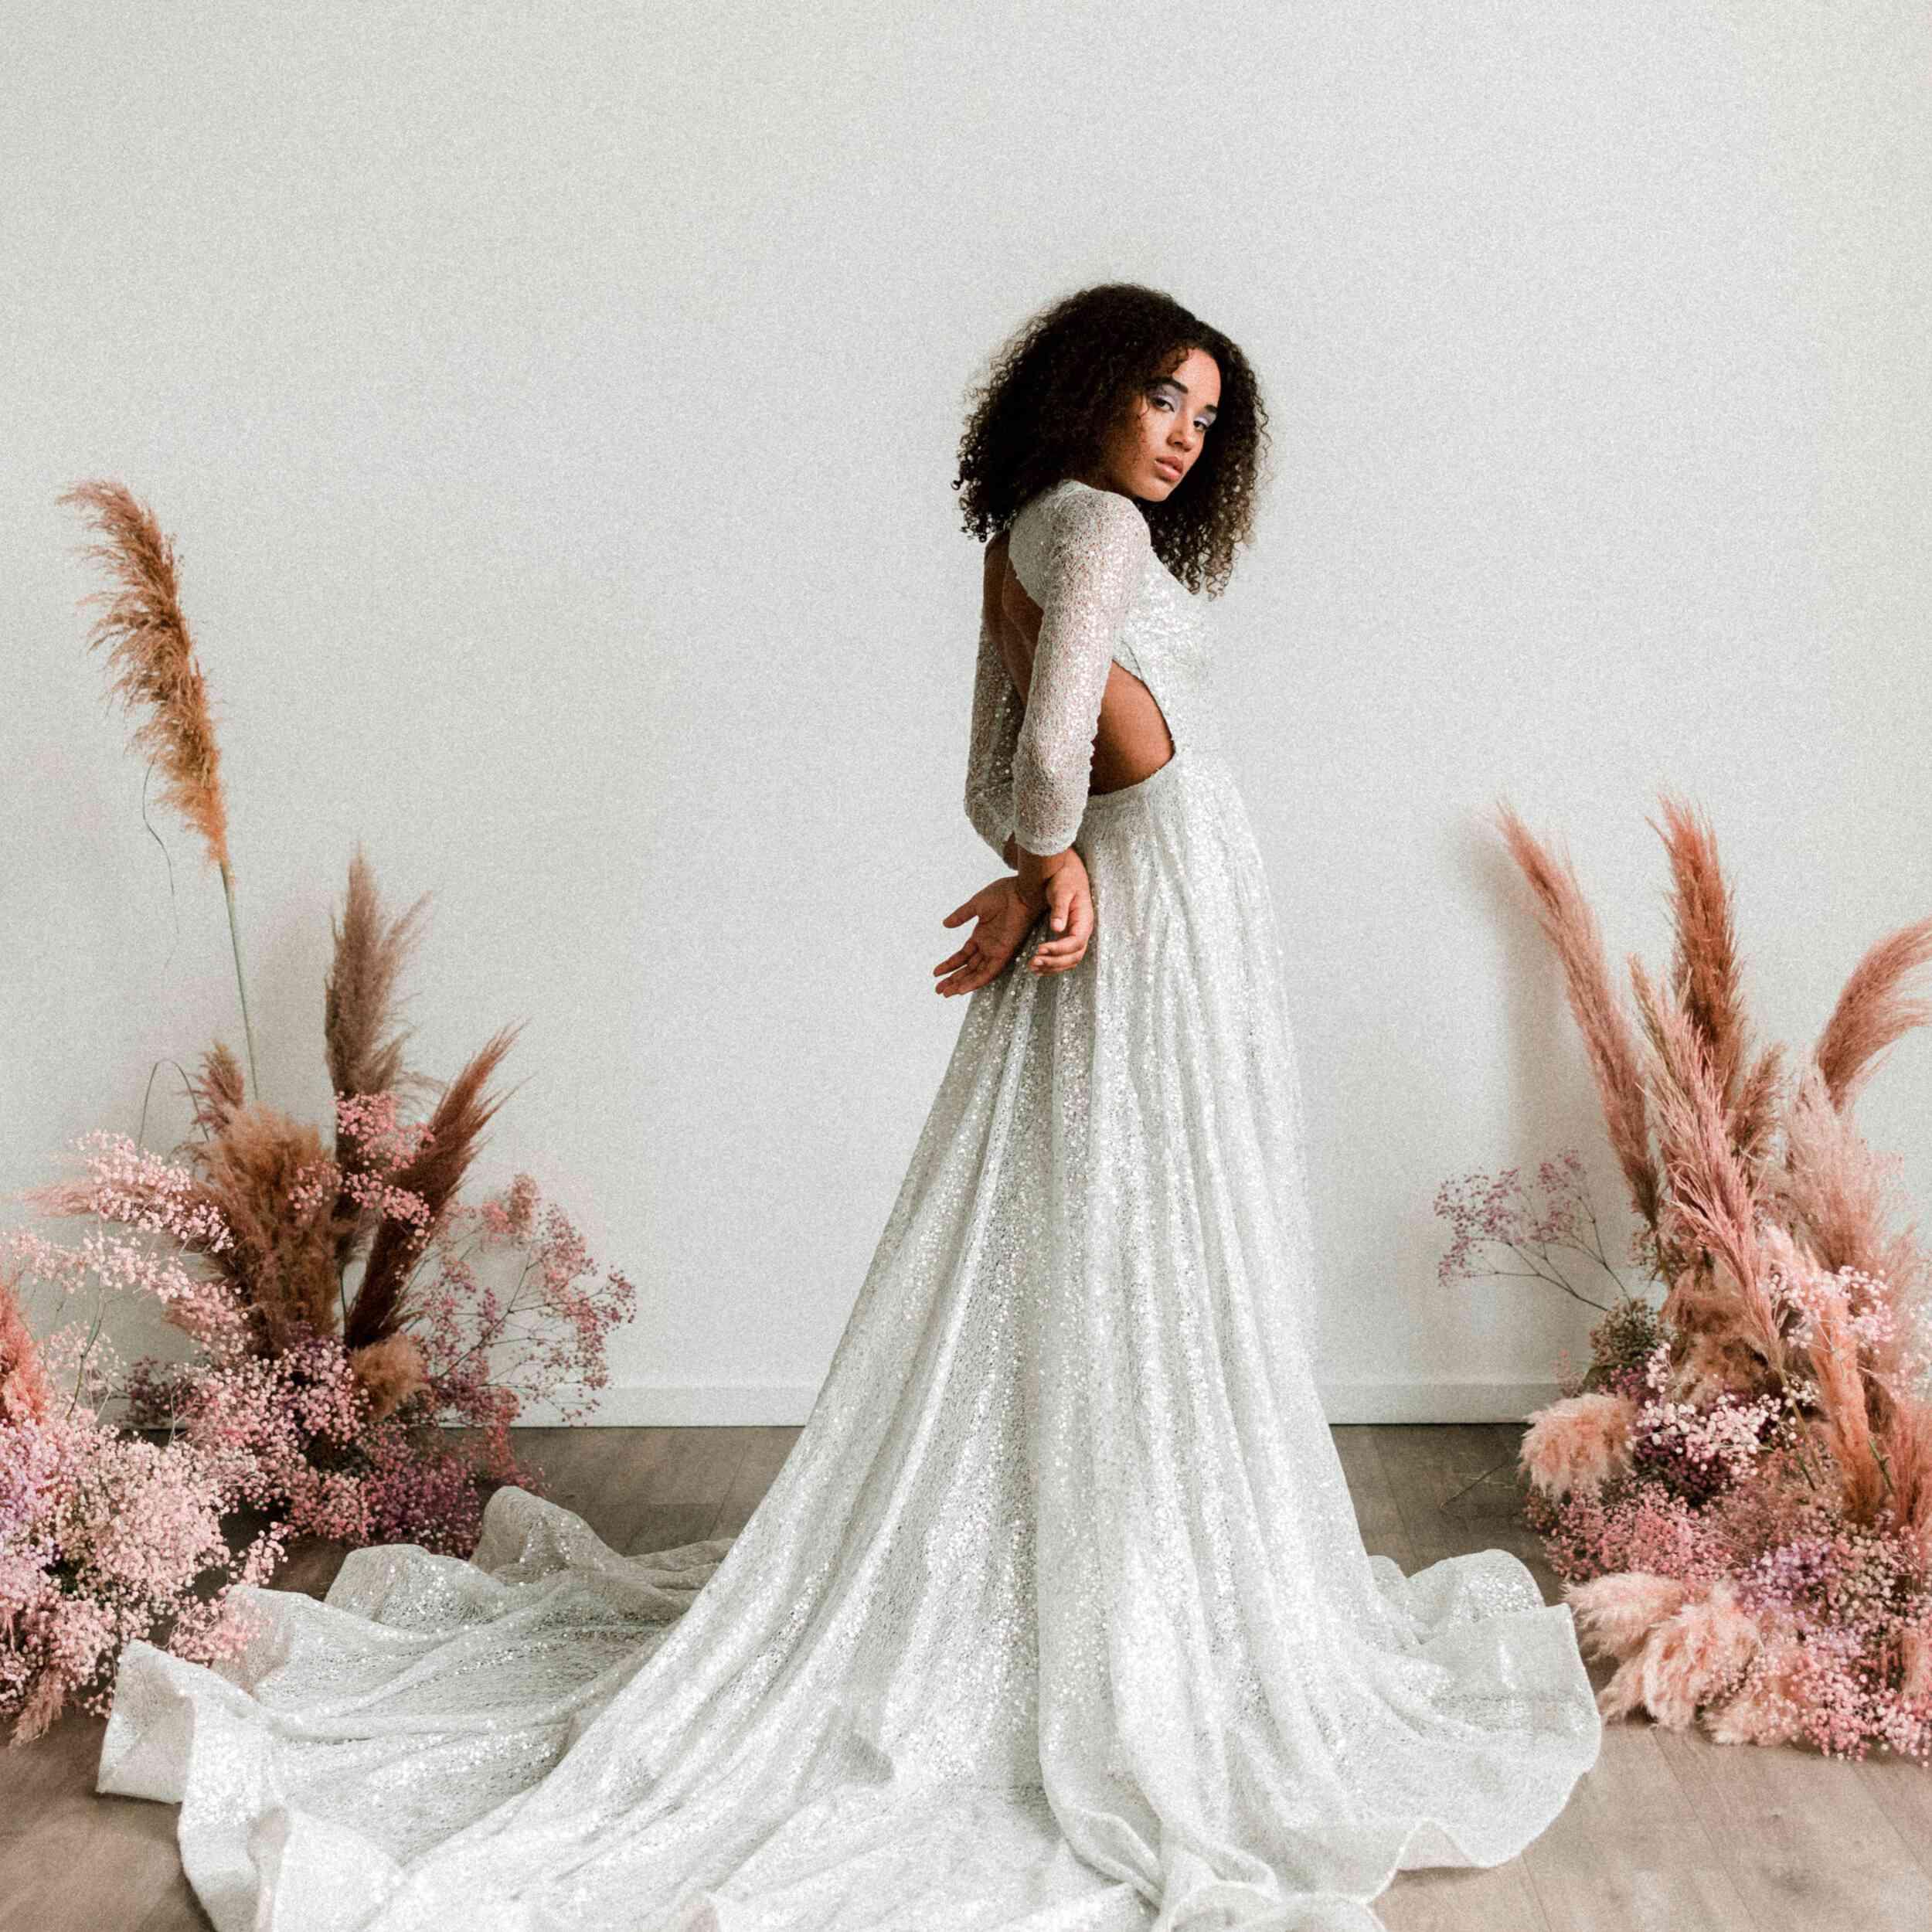 29 Stunning Silver Wedding Dresses For Bold Brides